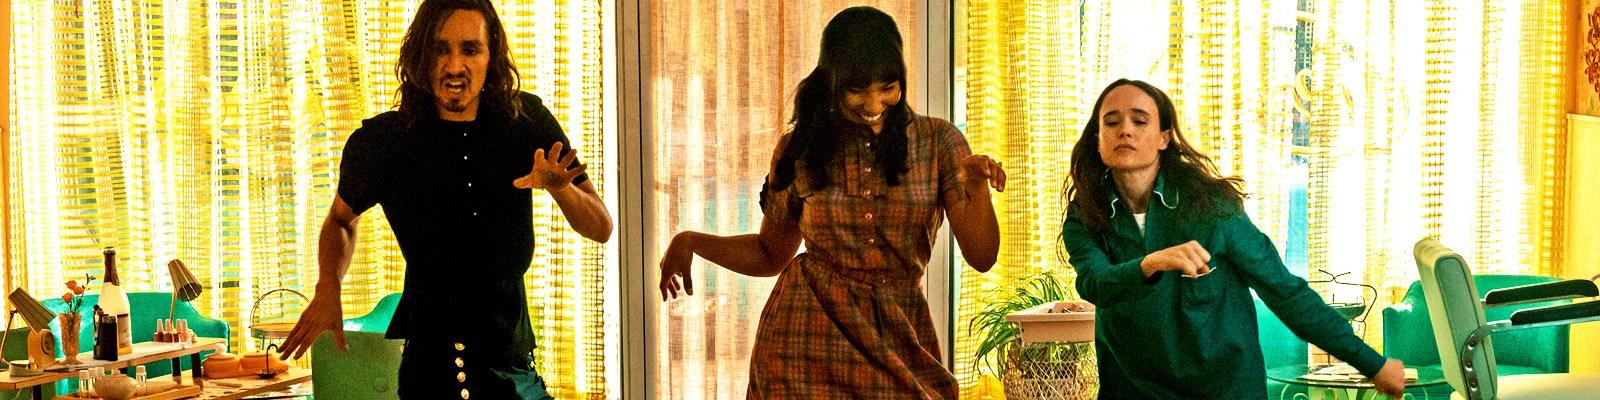 Netflix's 'The Umbrella Academy' Is An Absolute, Twist-Filled Blast In Season 2